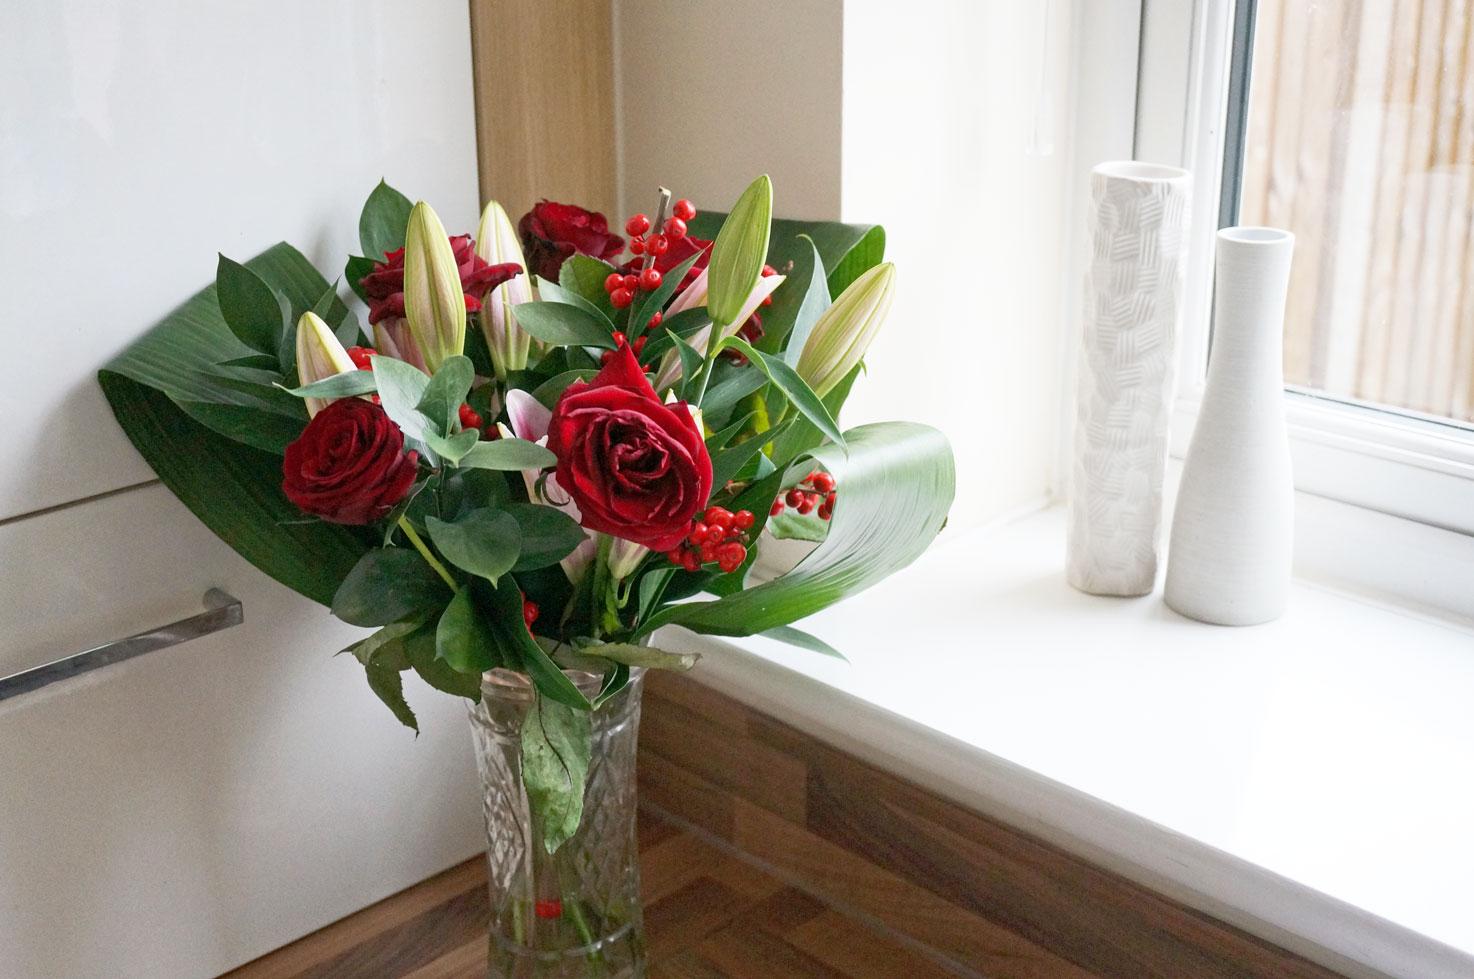 Debenhams Christmas Floral Bouquet & Offer! - Thou Shalt Not Covet...